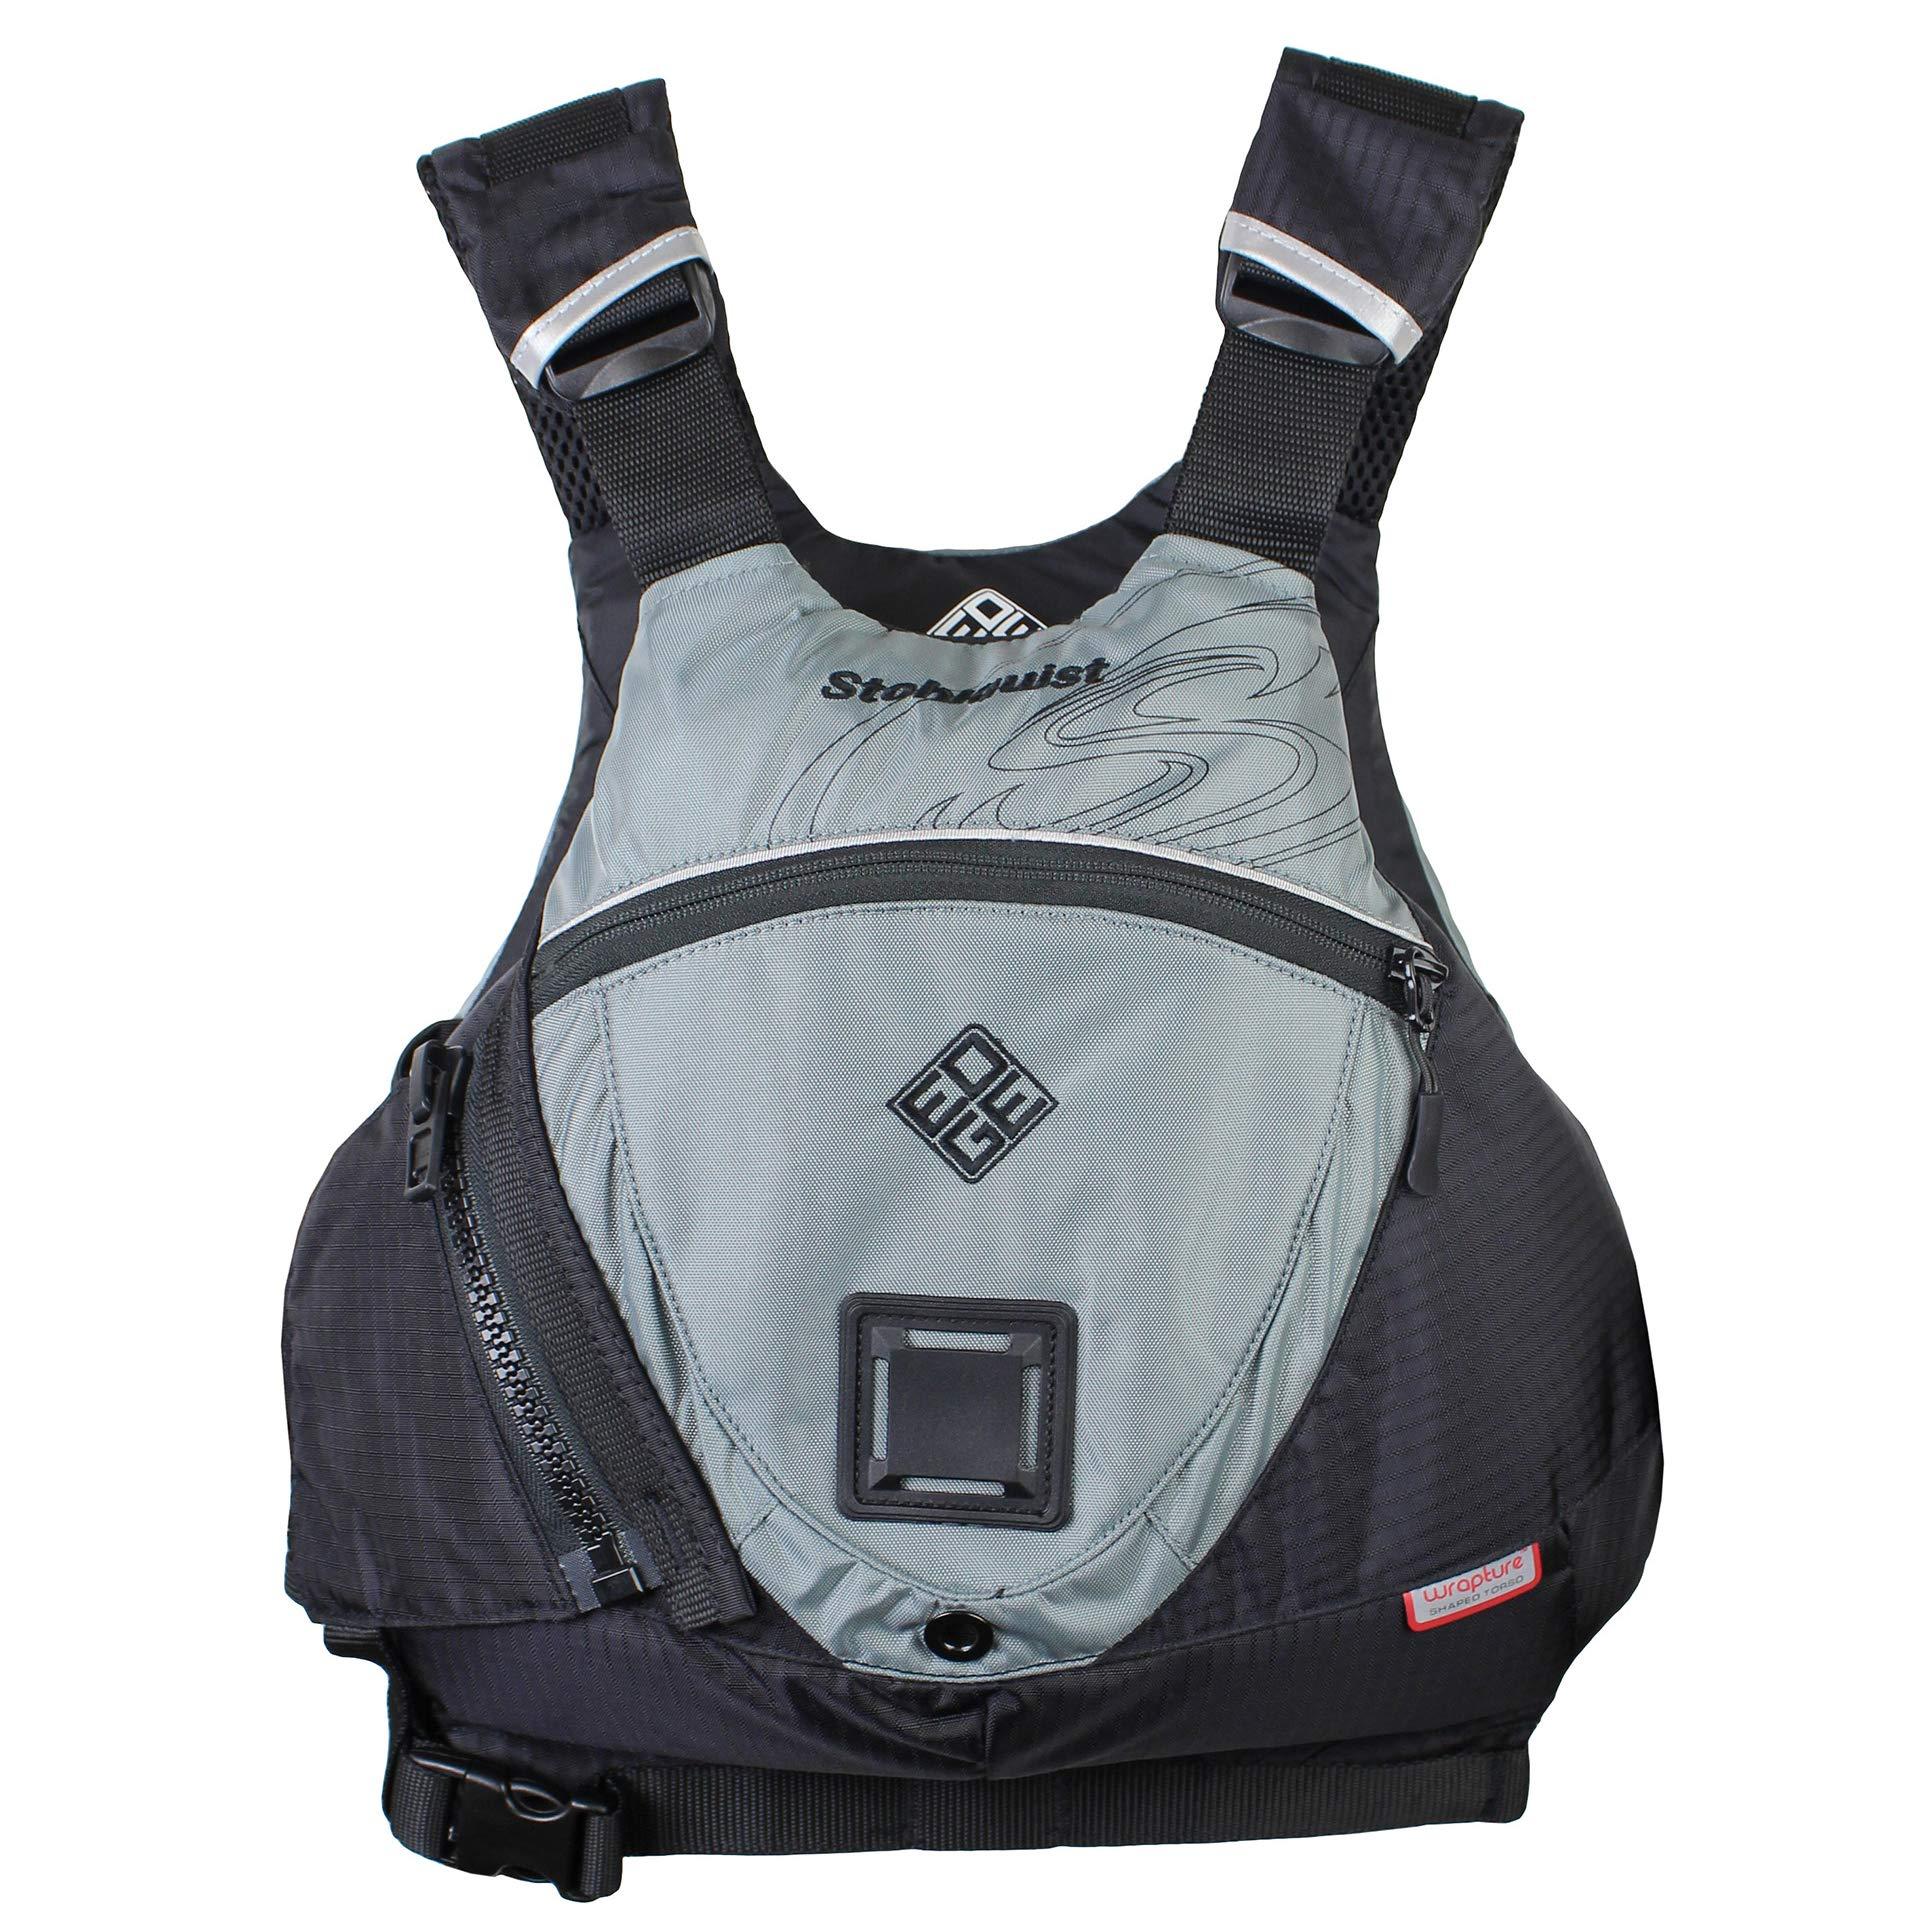 Stohlquist Edge Kayak Lifejacket-Gray-XXL